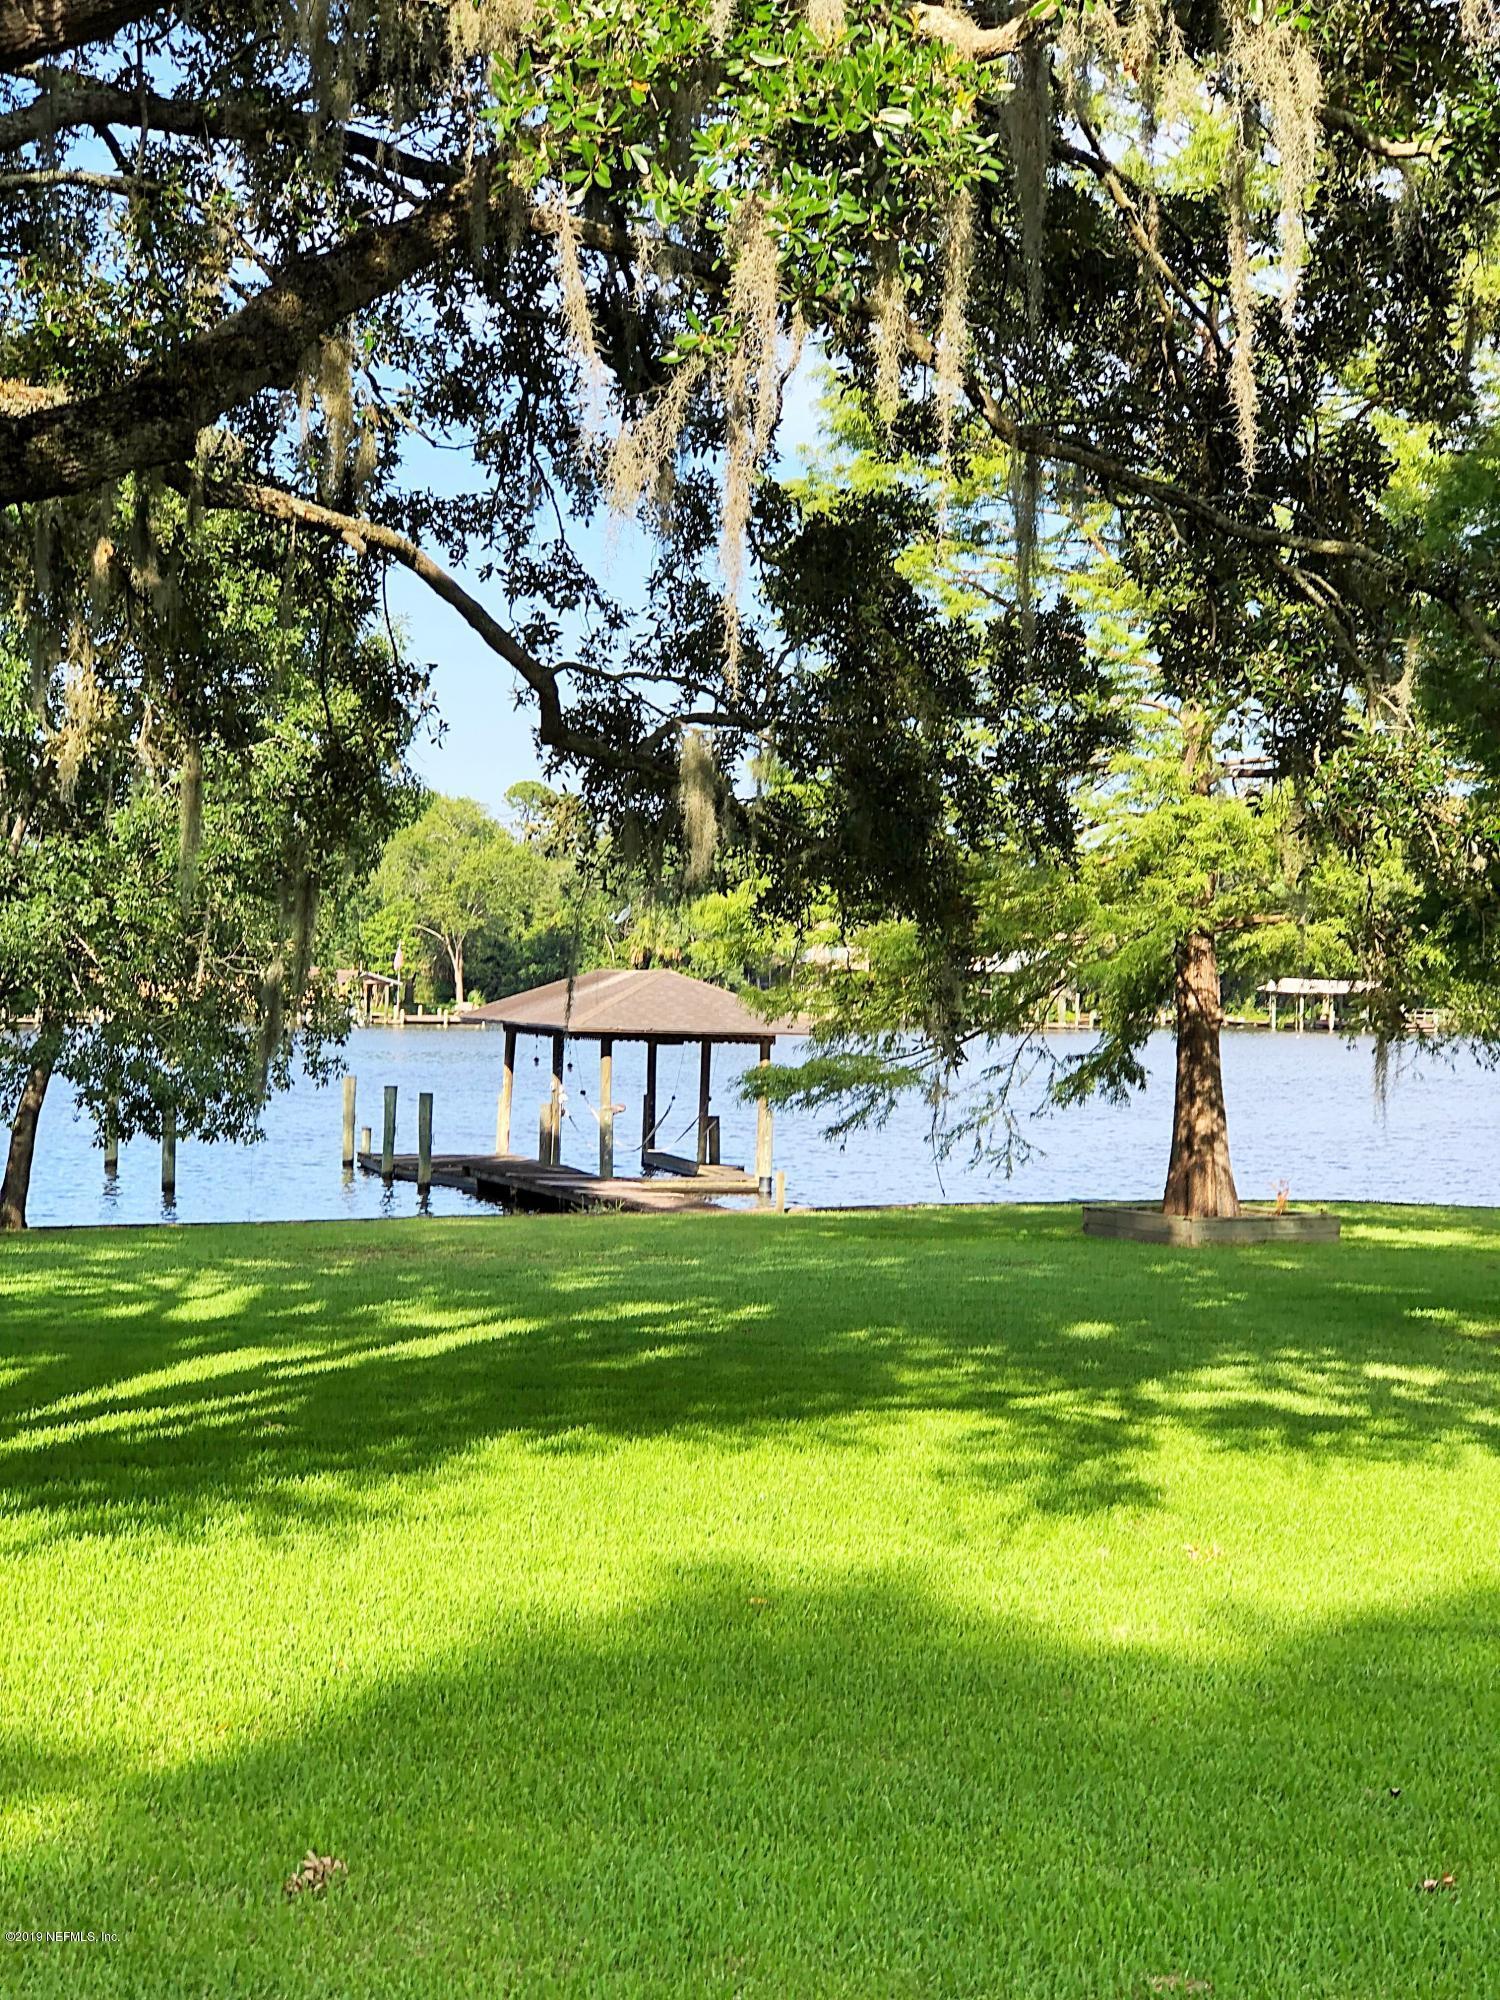 5701 WILSON, JACKSONVILLE, FLORIDA 32210, 2 Bedrooms Bedrooms, ,2 BathroomsBathrooms,Residential - single family,For sale,WILSON,1005498